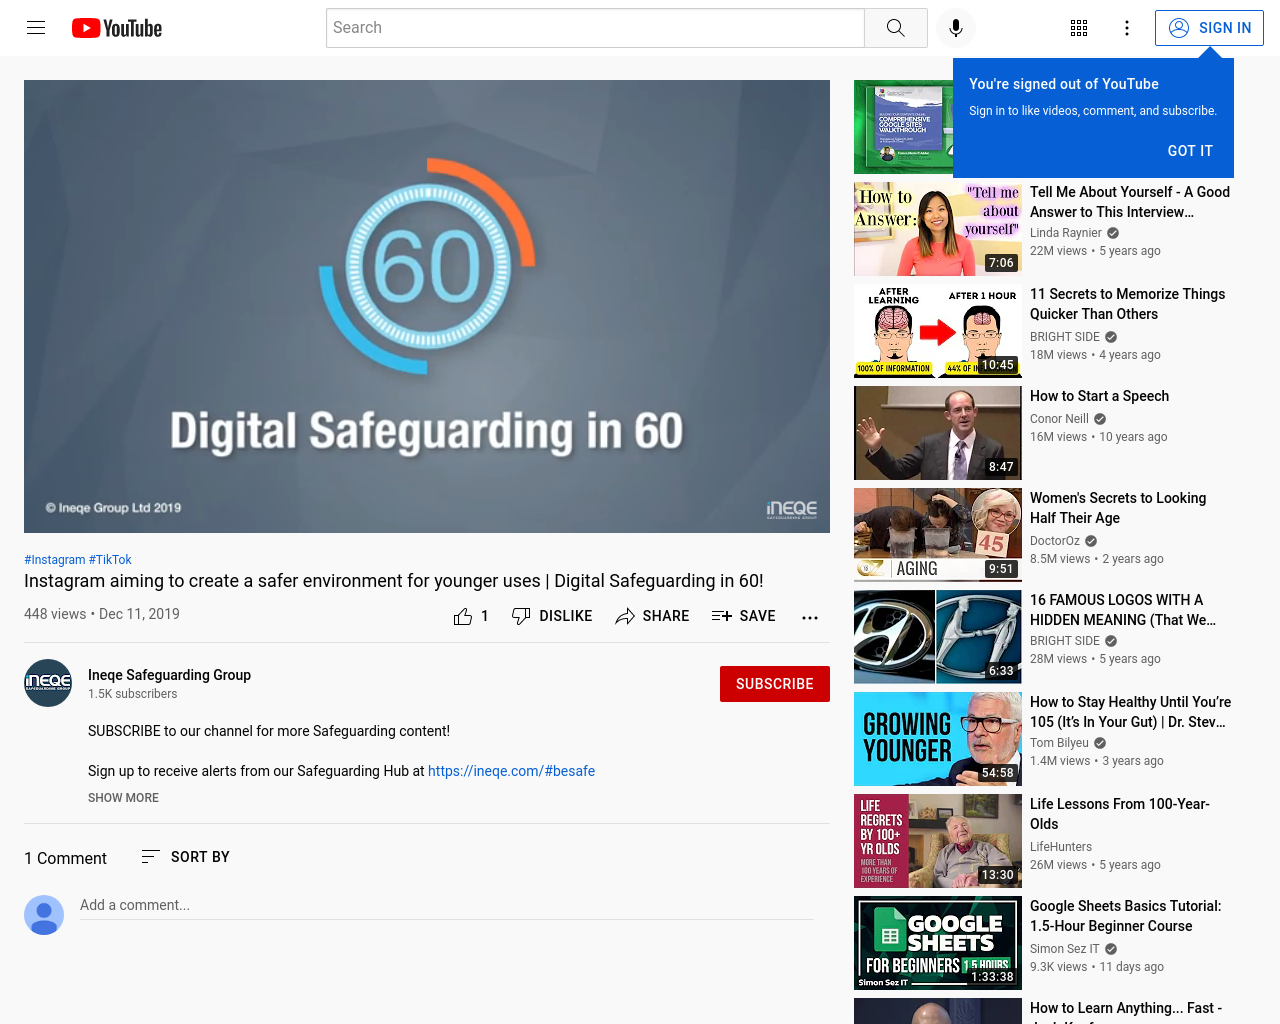 Digital safeguarding video link